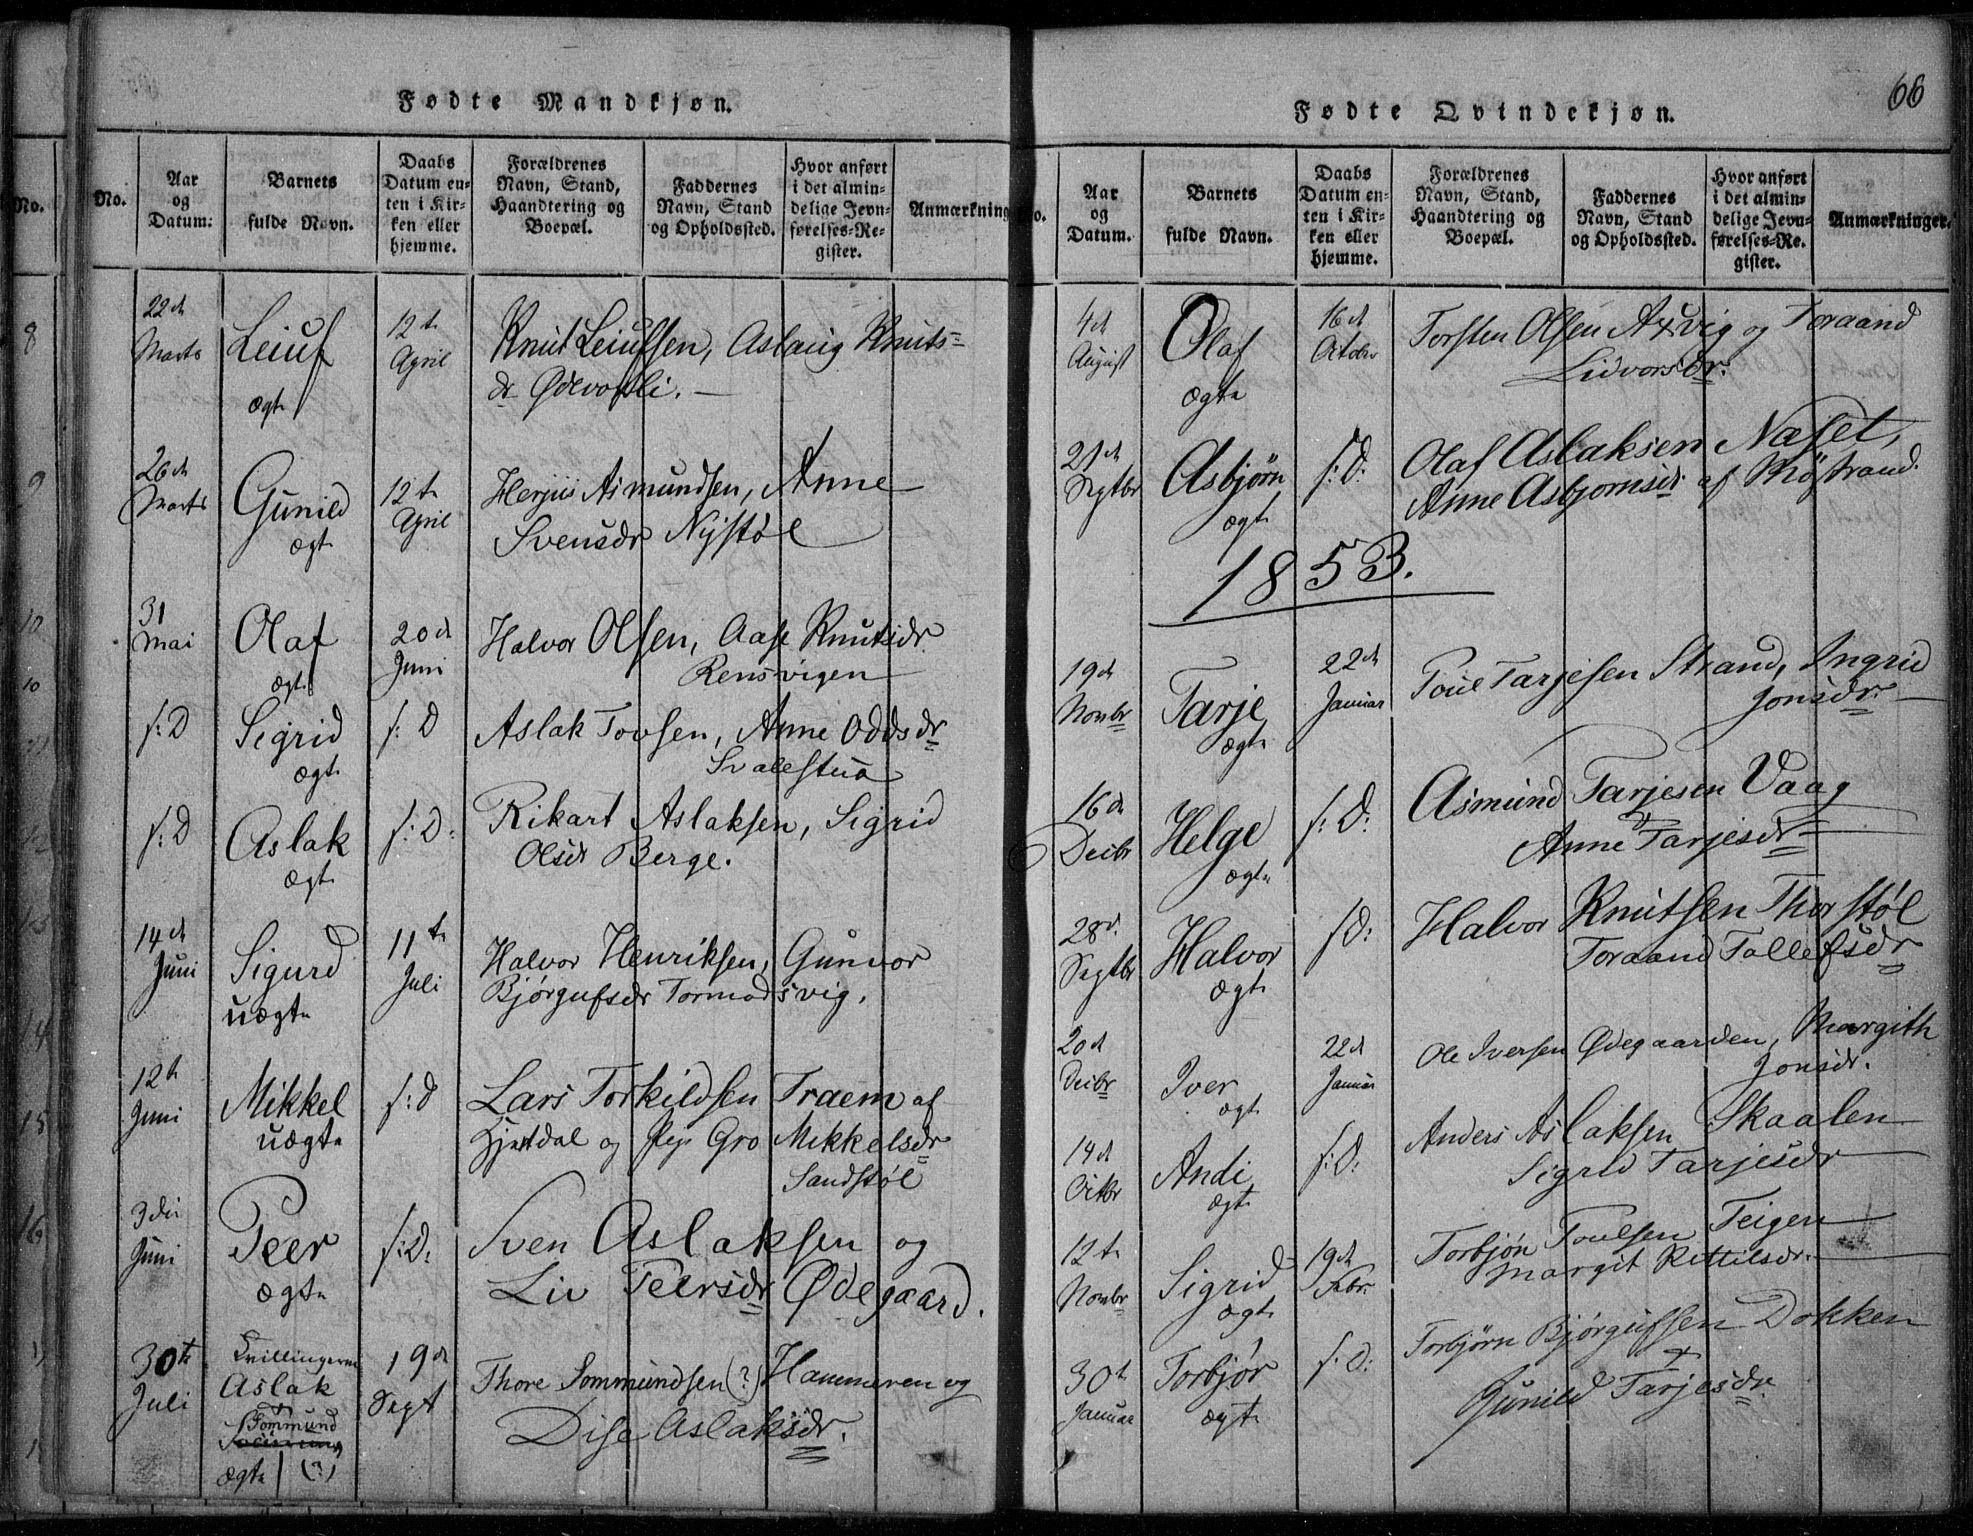 SAKO, Rauland kirkebøker, F/Fa/L0001: Ministerialbok nr. 1, 1814-1859, s. 66